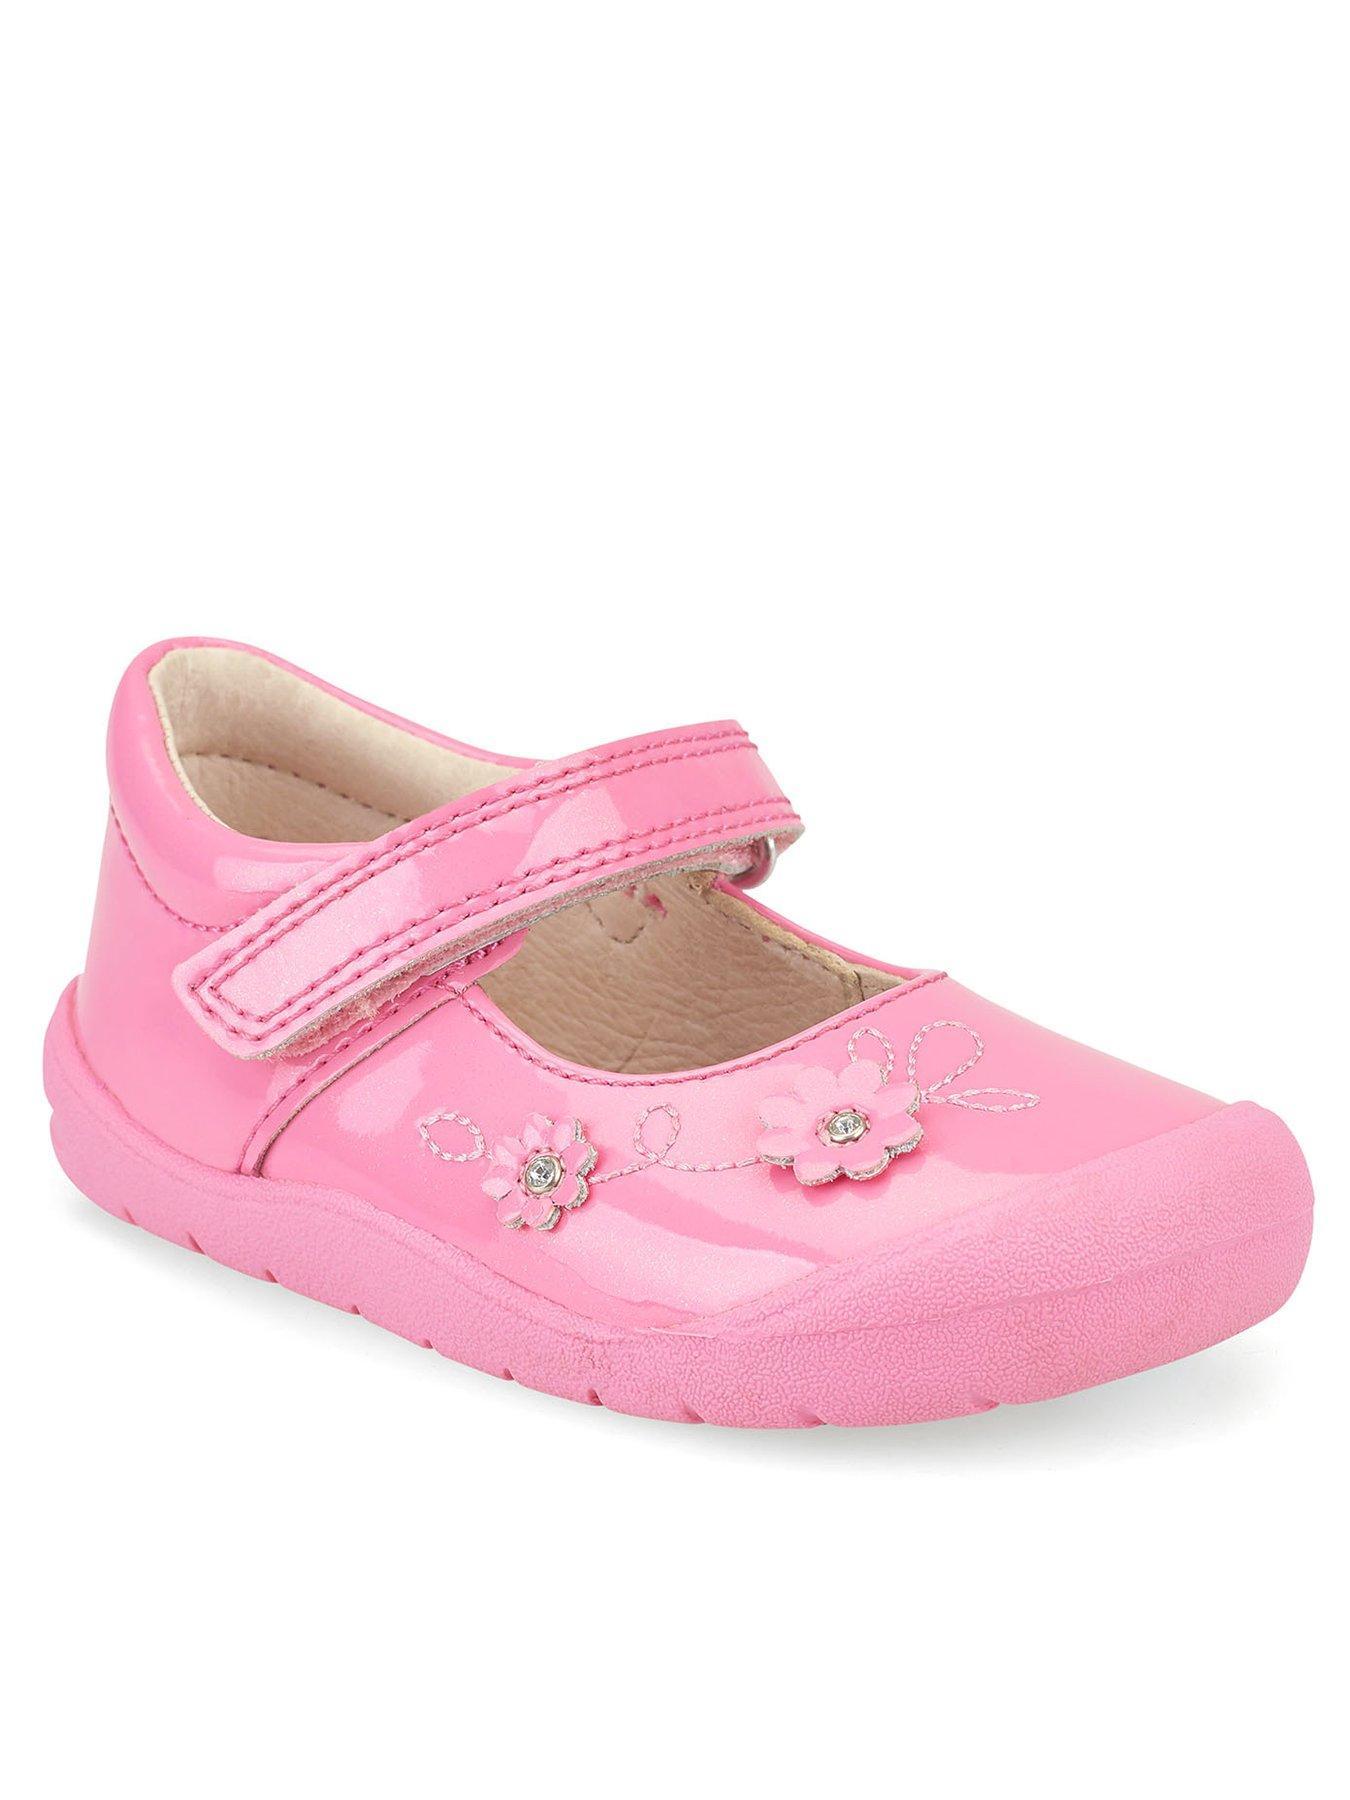 Girls Shoes   Boys Shoes   Kids Shoes